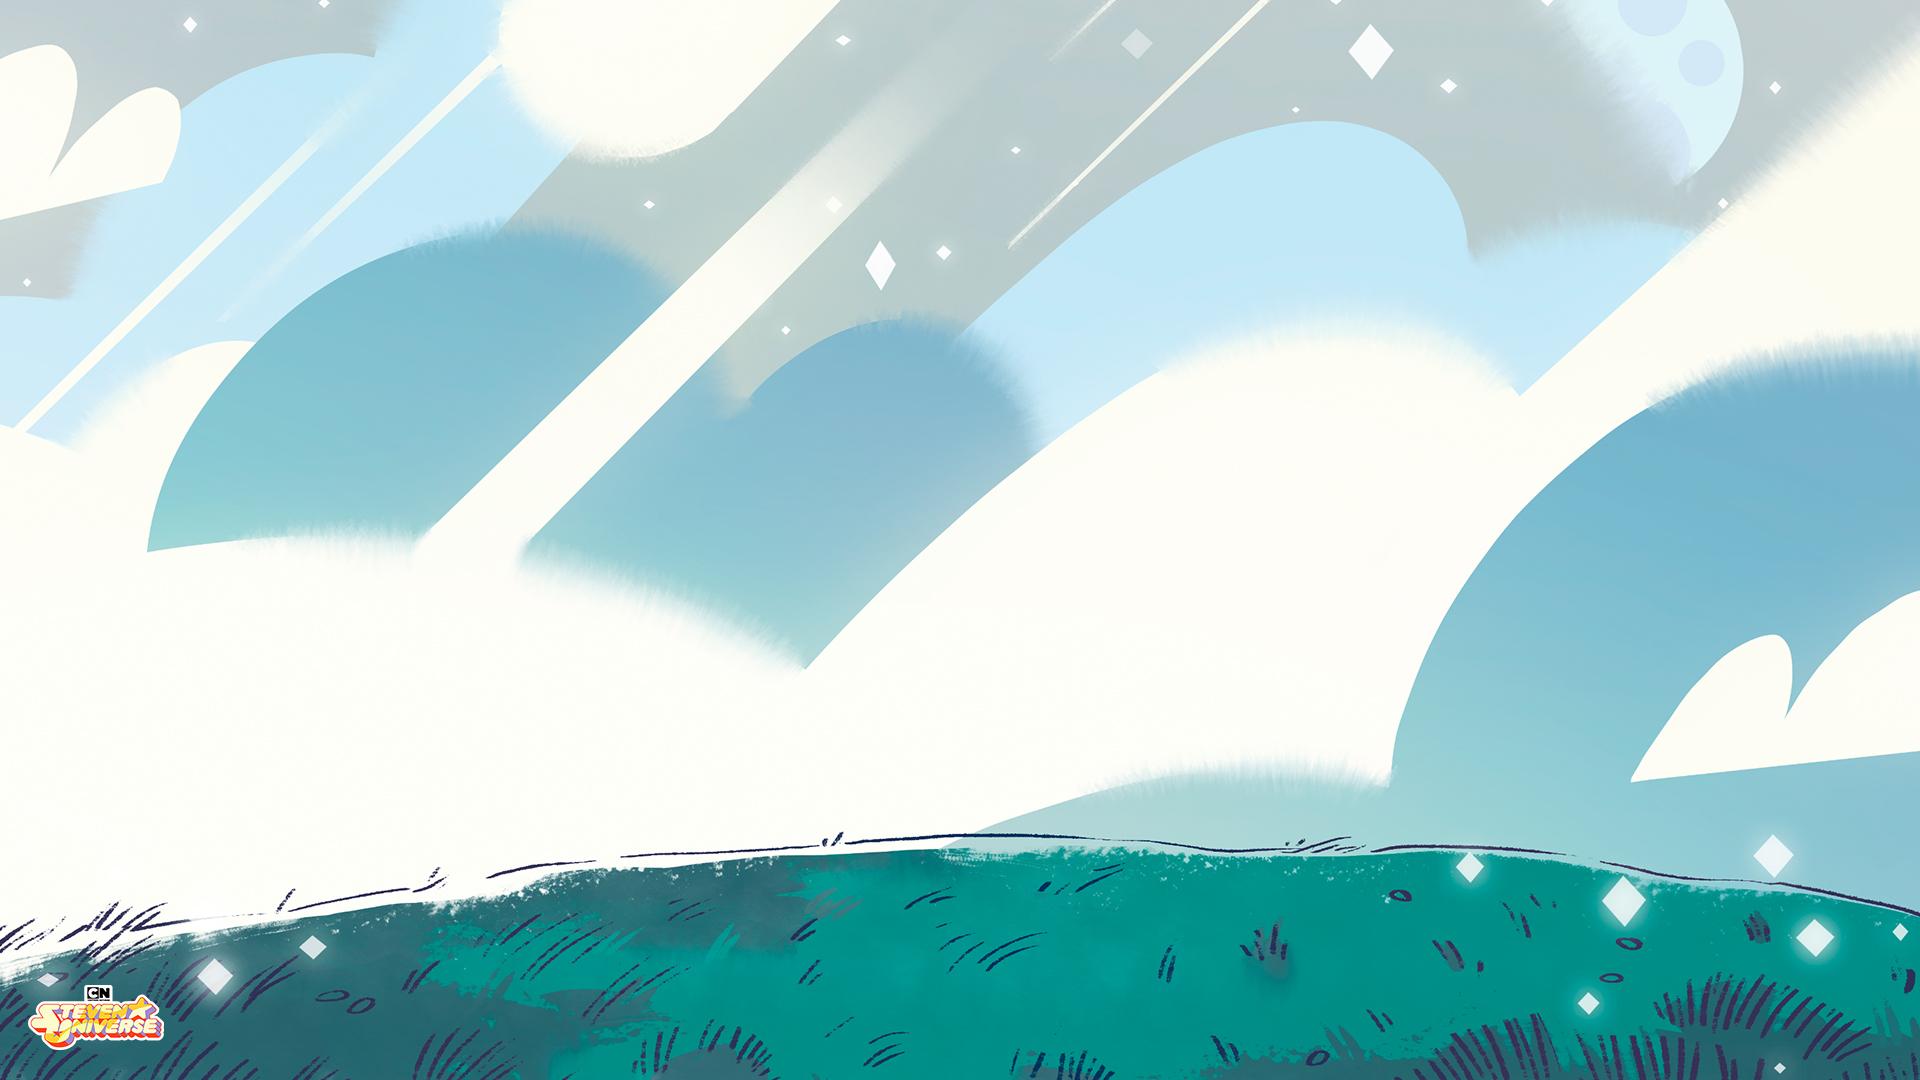 General 1920x1080 Steven Universe Steven Universe (TV Show) Cartoon Network